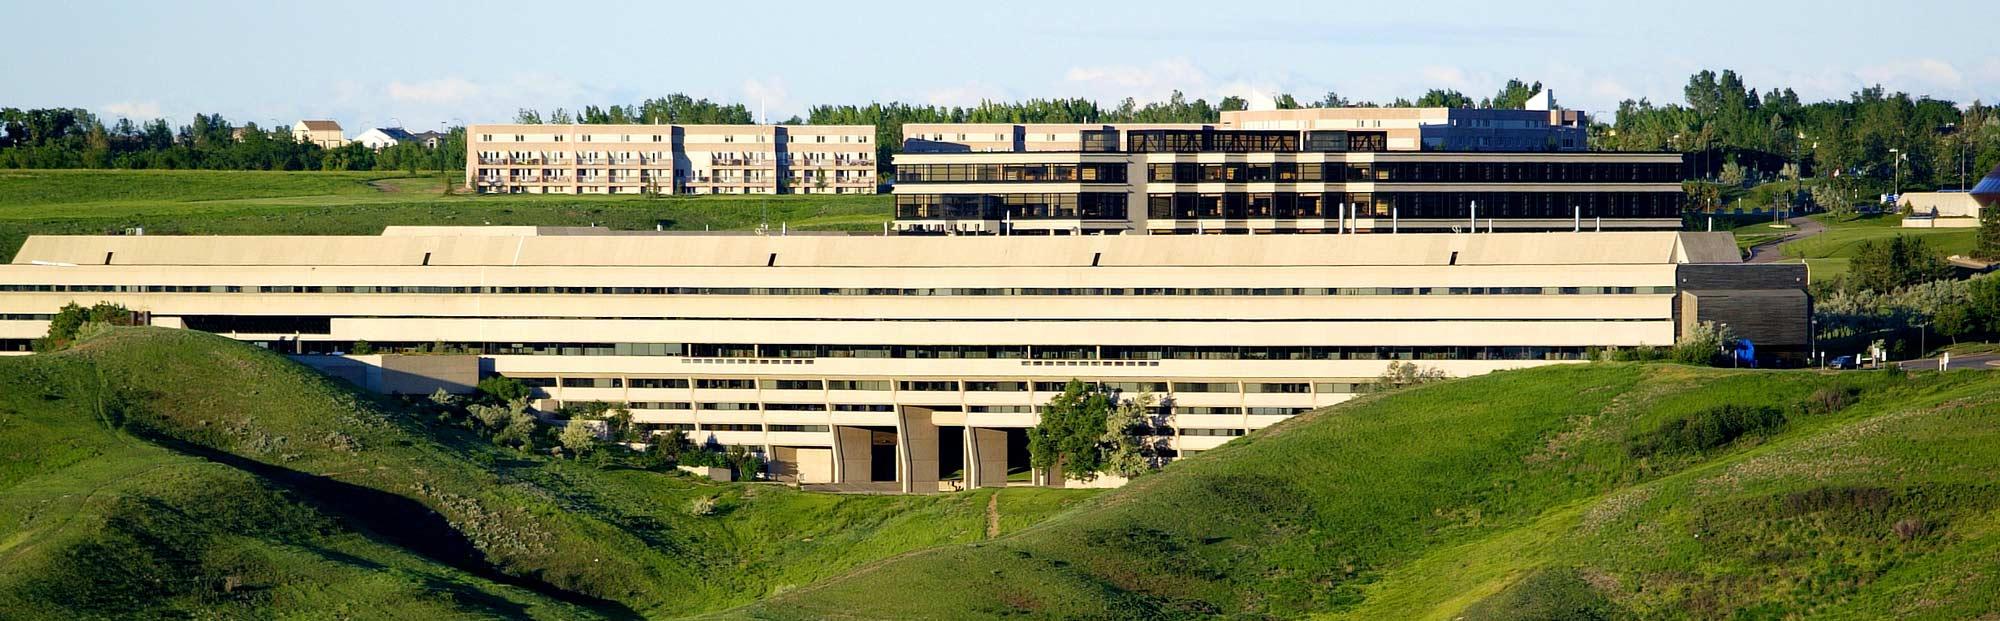 University of Lethbridge campus